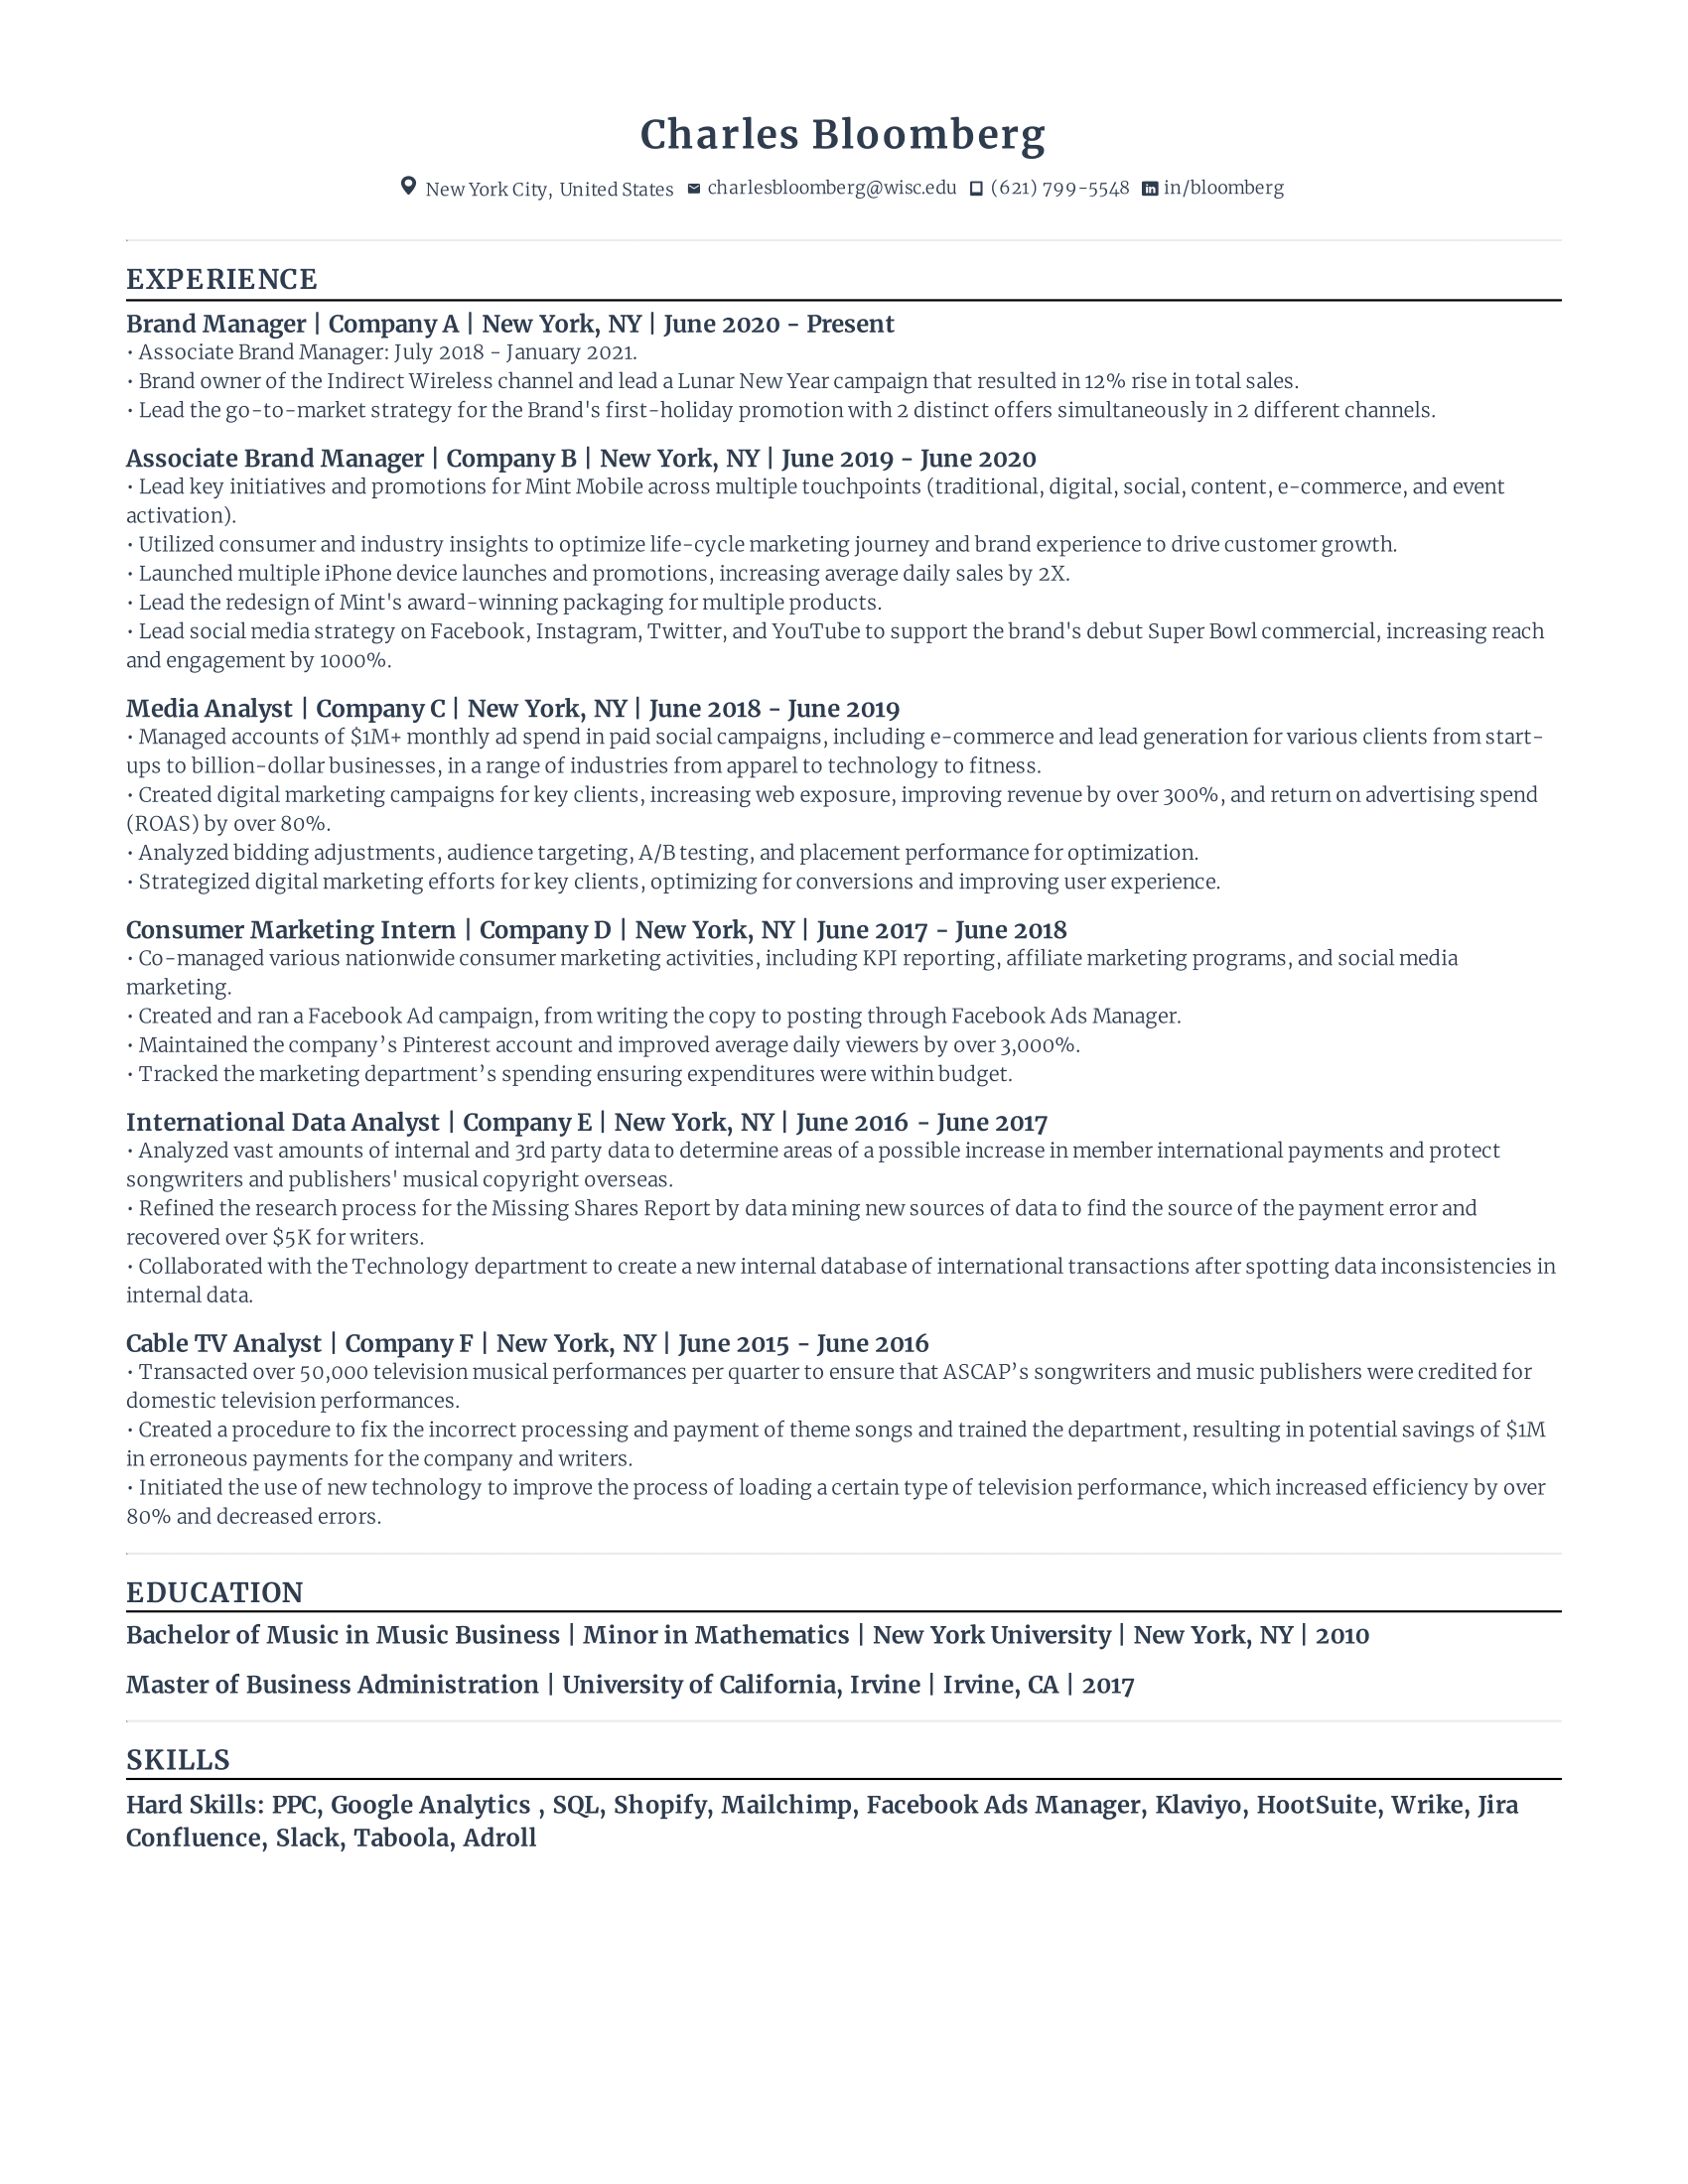 Brand Manager Resume Resume